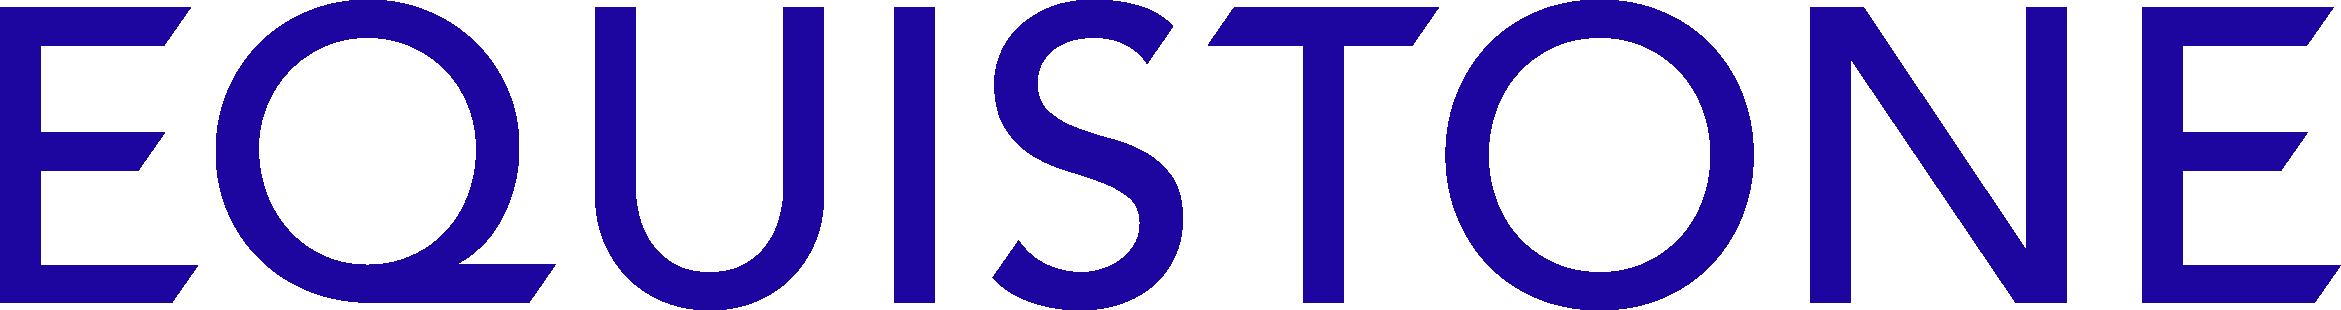 Equistone logo